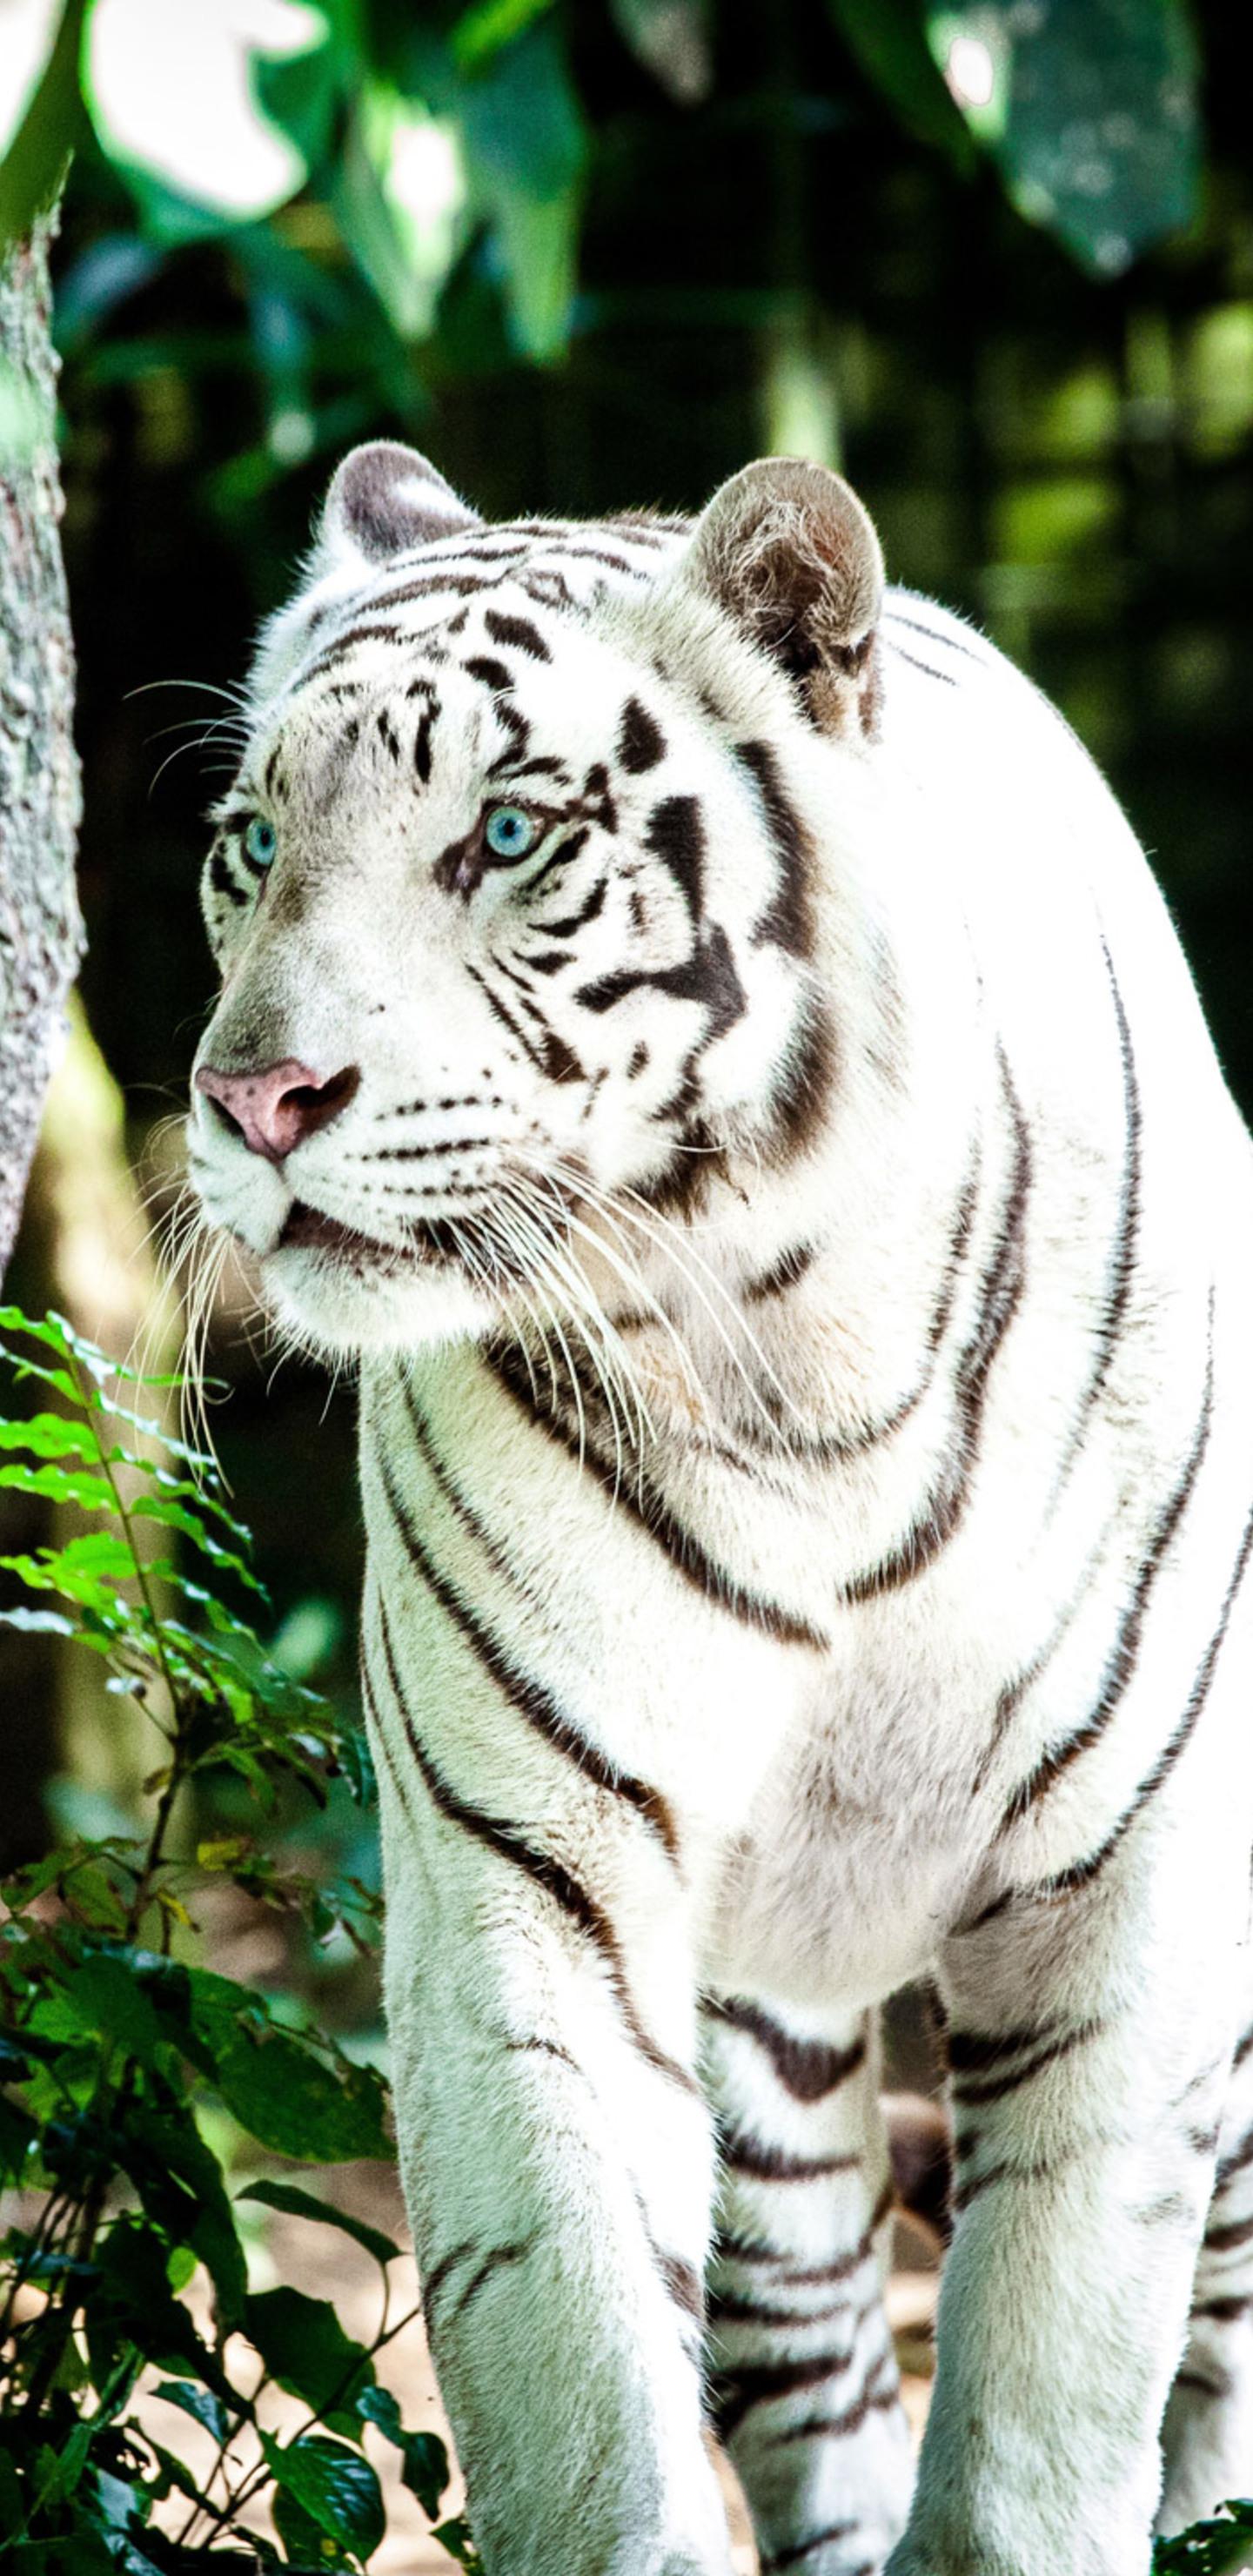 1440x2960 White Tiger 4k Samsung Galaxy Note 9 8 S9 S8 S8 Qhd Hd